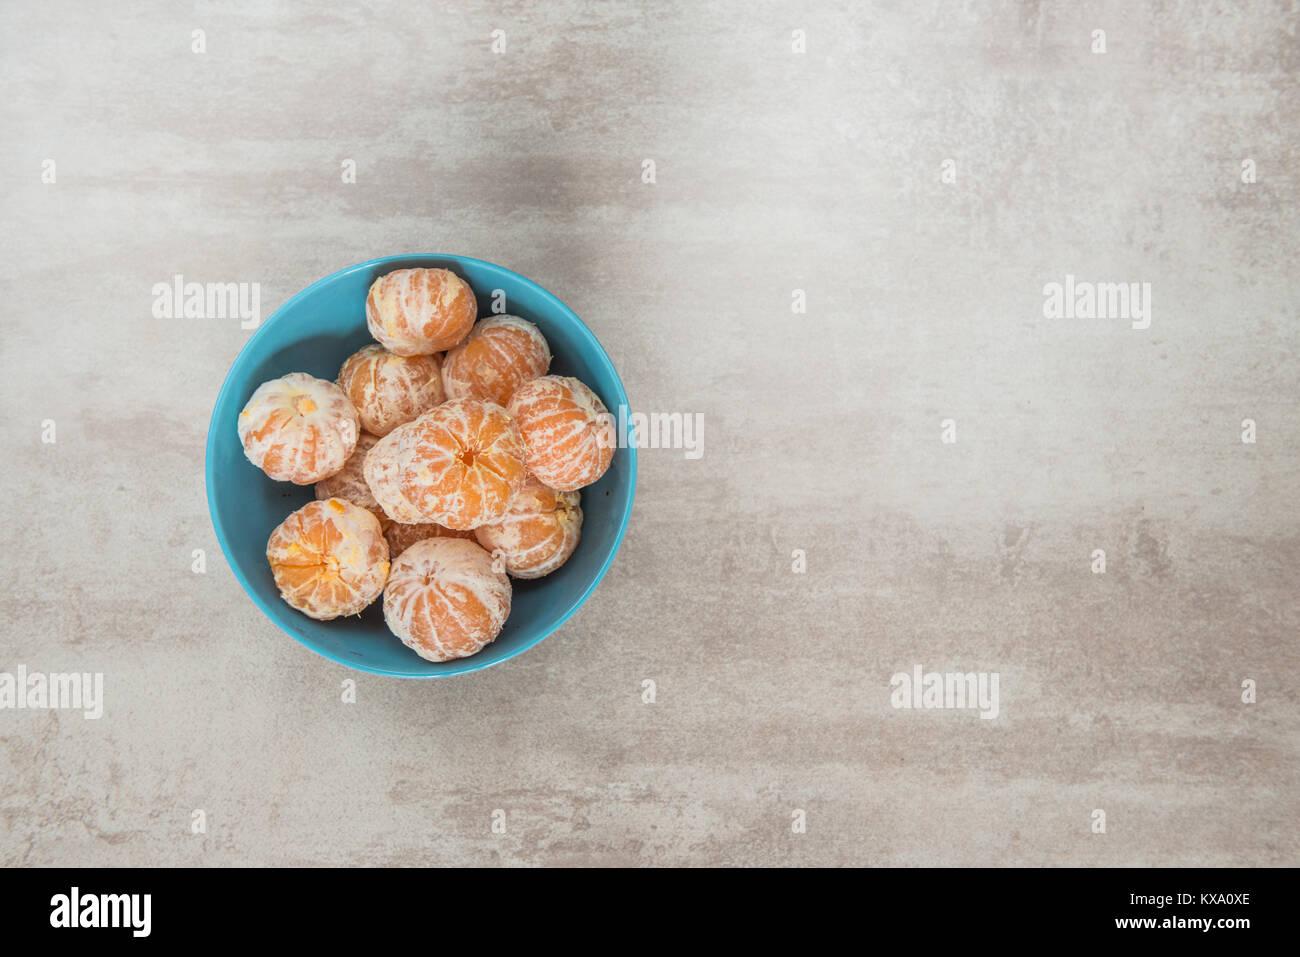 Orange Mandarines, Clementines, Tangerines or small oranges - Stock Image